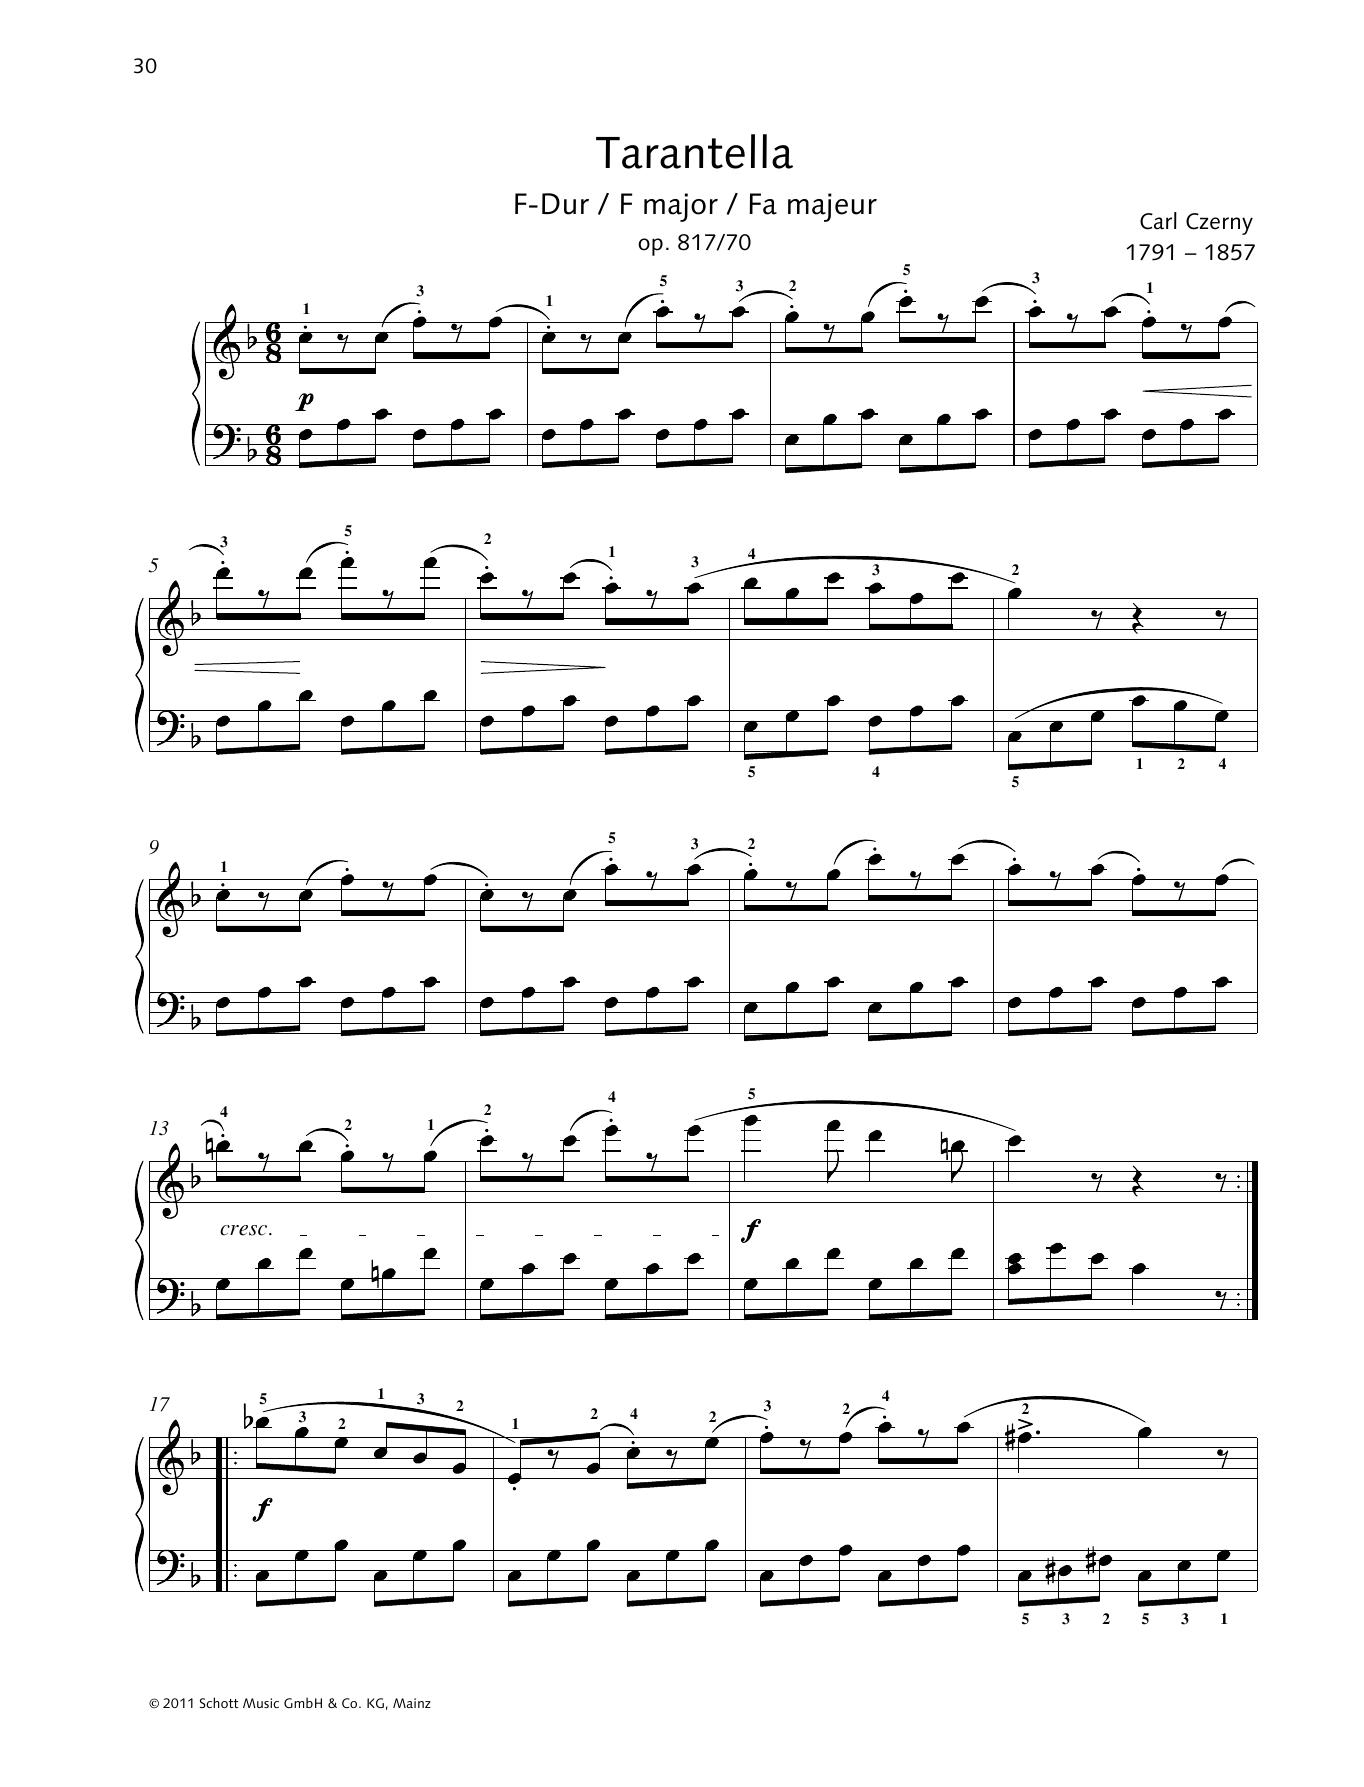 Tarantella F major Sheet Music